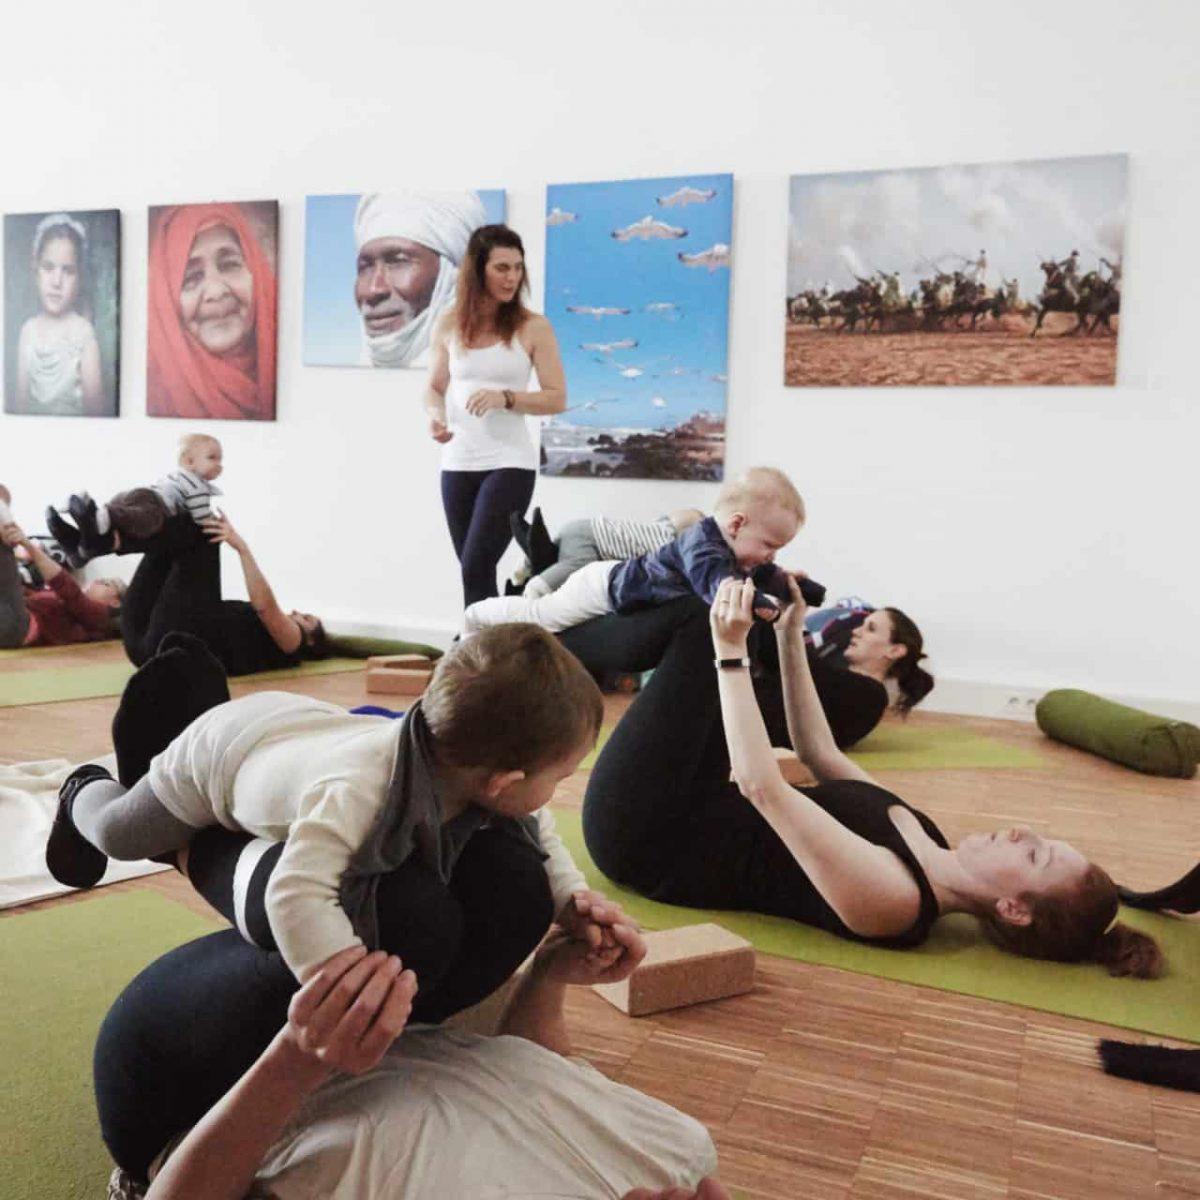 YogaManufaktur_Wuerzburg_Buergerbraeugelaende_Postnatal_Yoga_mit_Baby